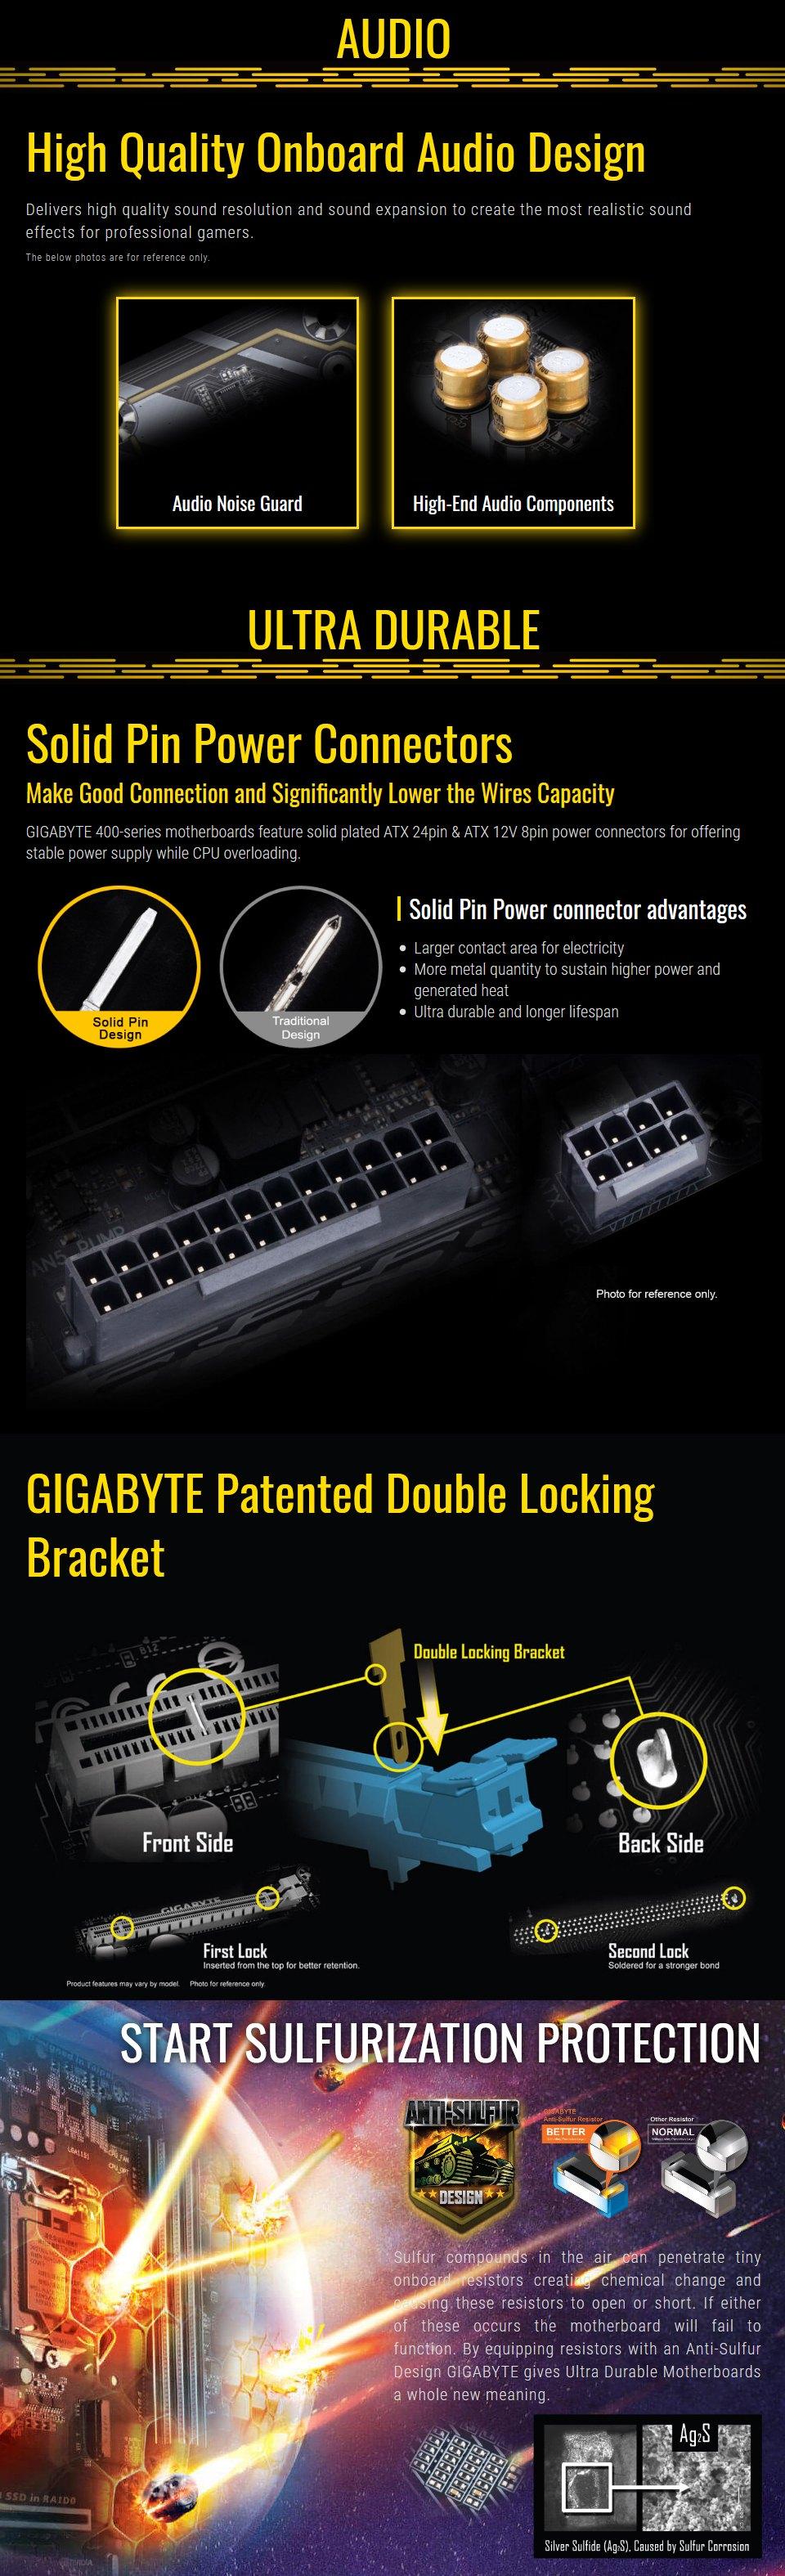 Buy Gigabyte B450m Ds3h Wi Fi Motherboard B450m Ds3h Wifi Pc Case Gear Australia